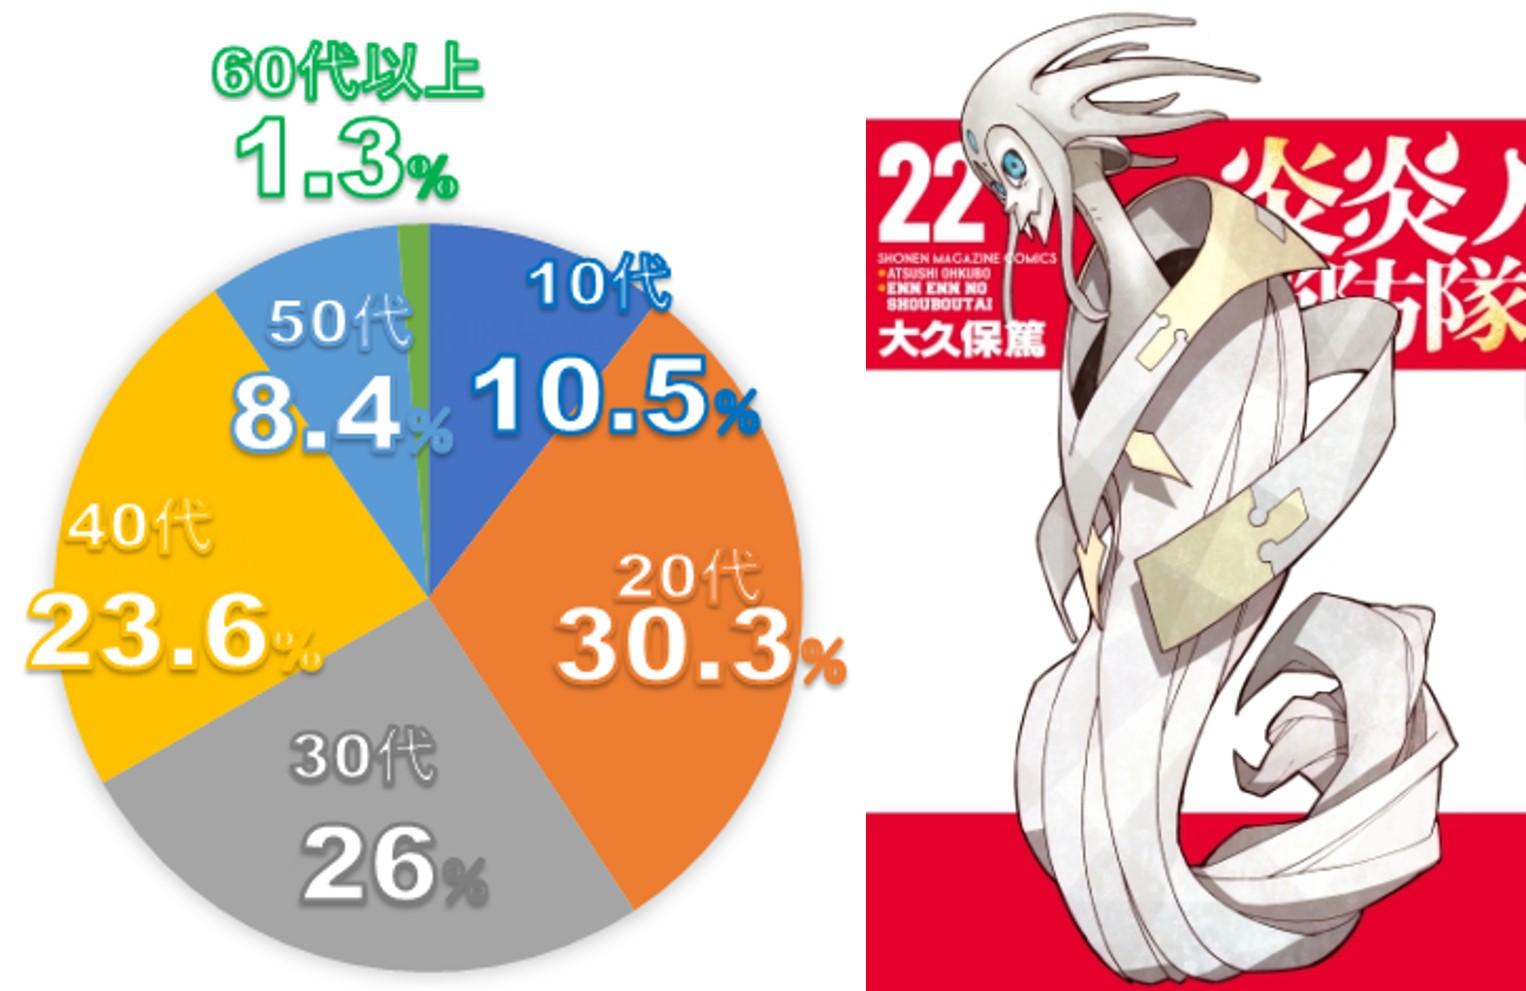 %e3%82%a2%e3%83%8b%e3%83%a1%e5%8e%9f%e4%bd%9c%e6%9c%ac%e3%83%a9%e3%83%b3%e3%82%ad%e3%83%b3%e3%82%b0-anime-ranking-%e5%8b%95%e6%bc%ab%e6%8e%92%e5%90%8d5